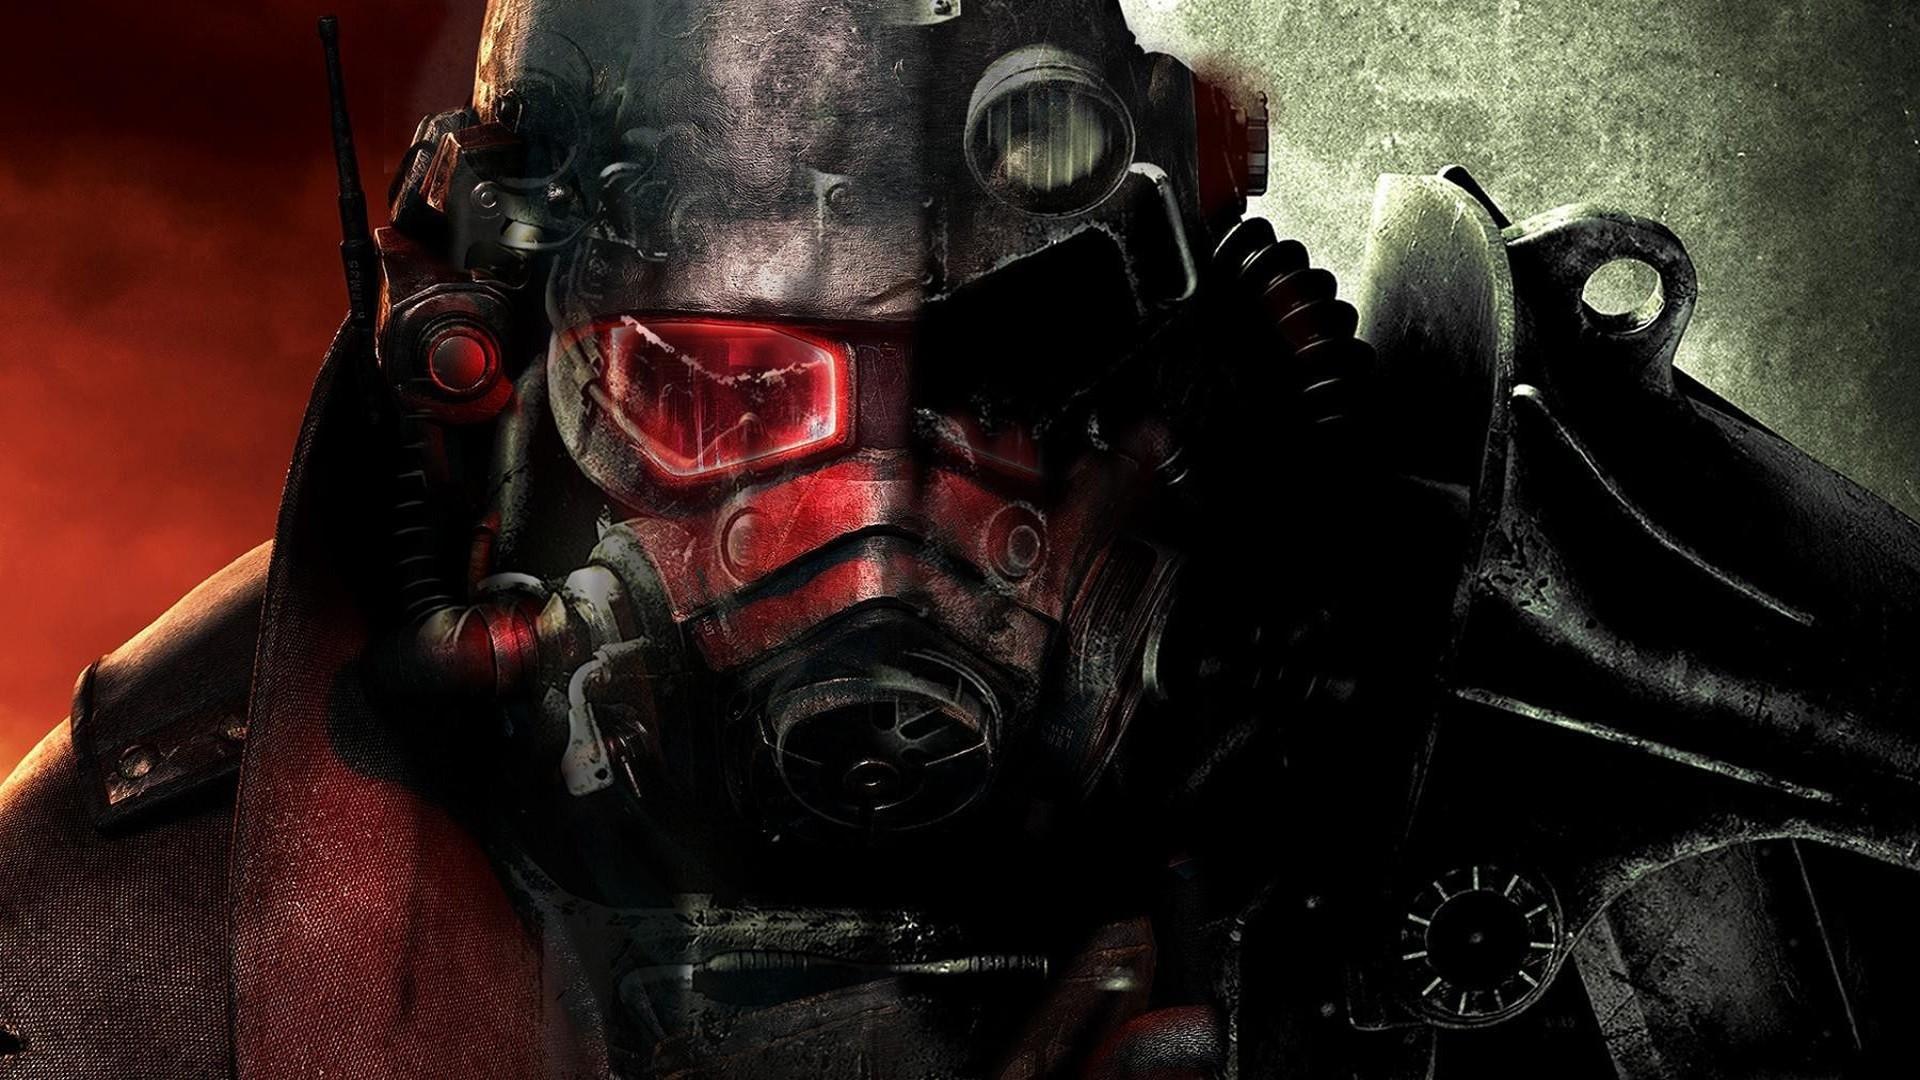 Apocalypse Fallout 3 New California Republic Fallout Fallout New 1920x1080